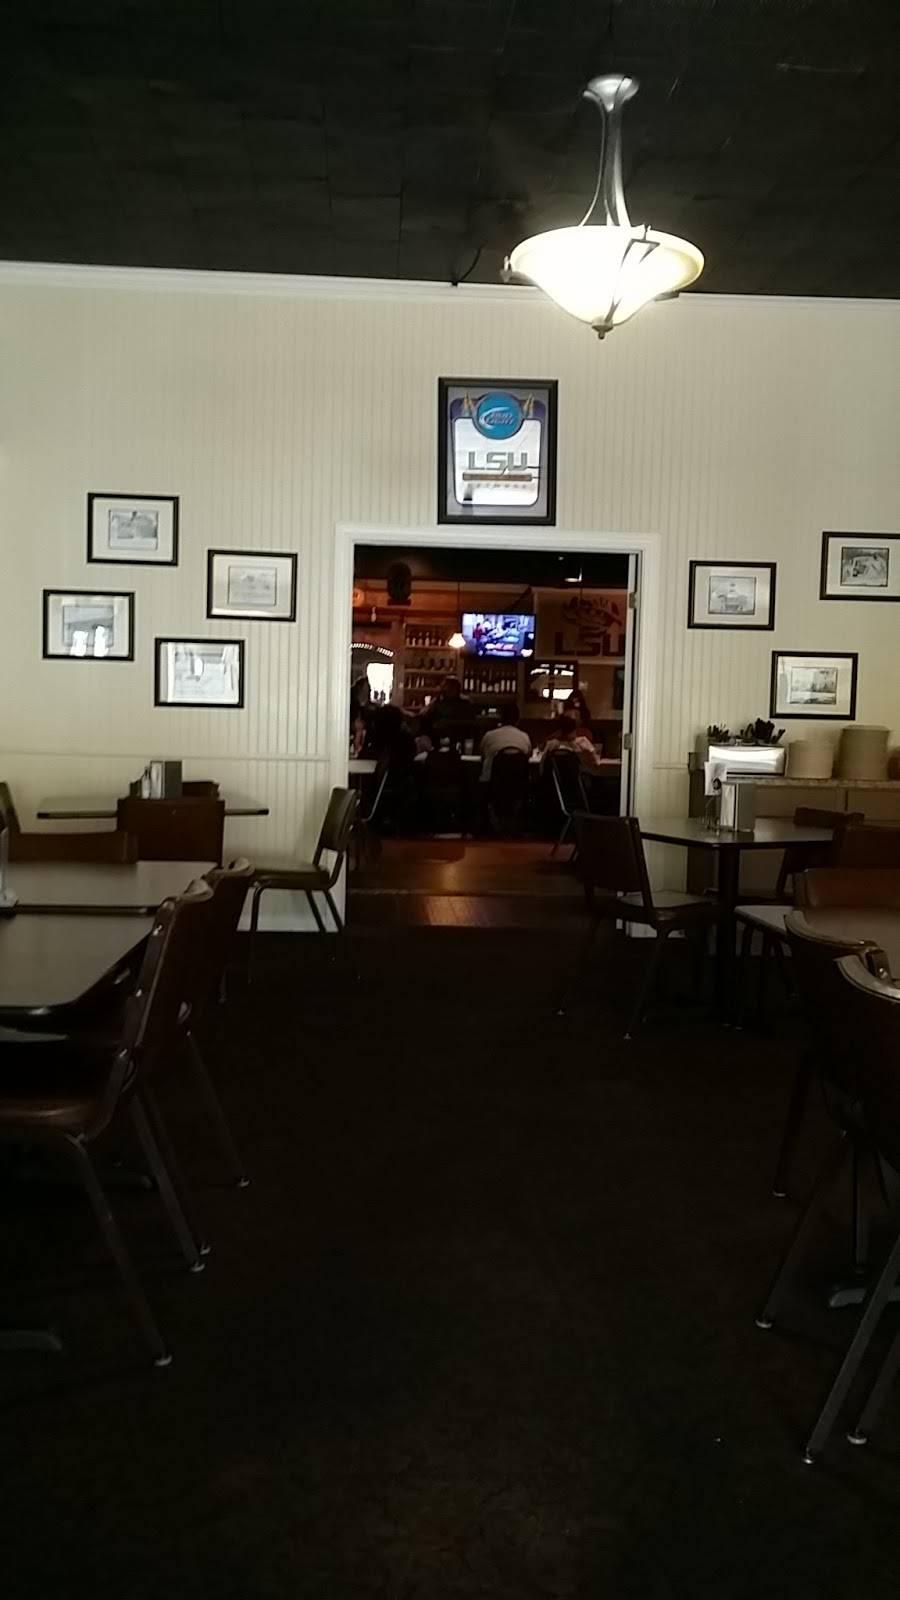 Main Street pub&grill | restaurant | 205 W Main St, Ville Platte, LA 70586, USA | 3373631001 OR +1 337-363-1001